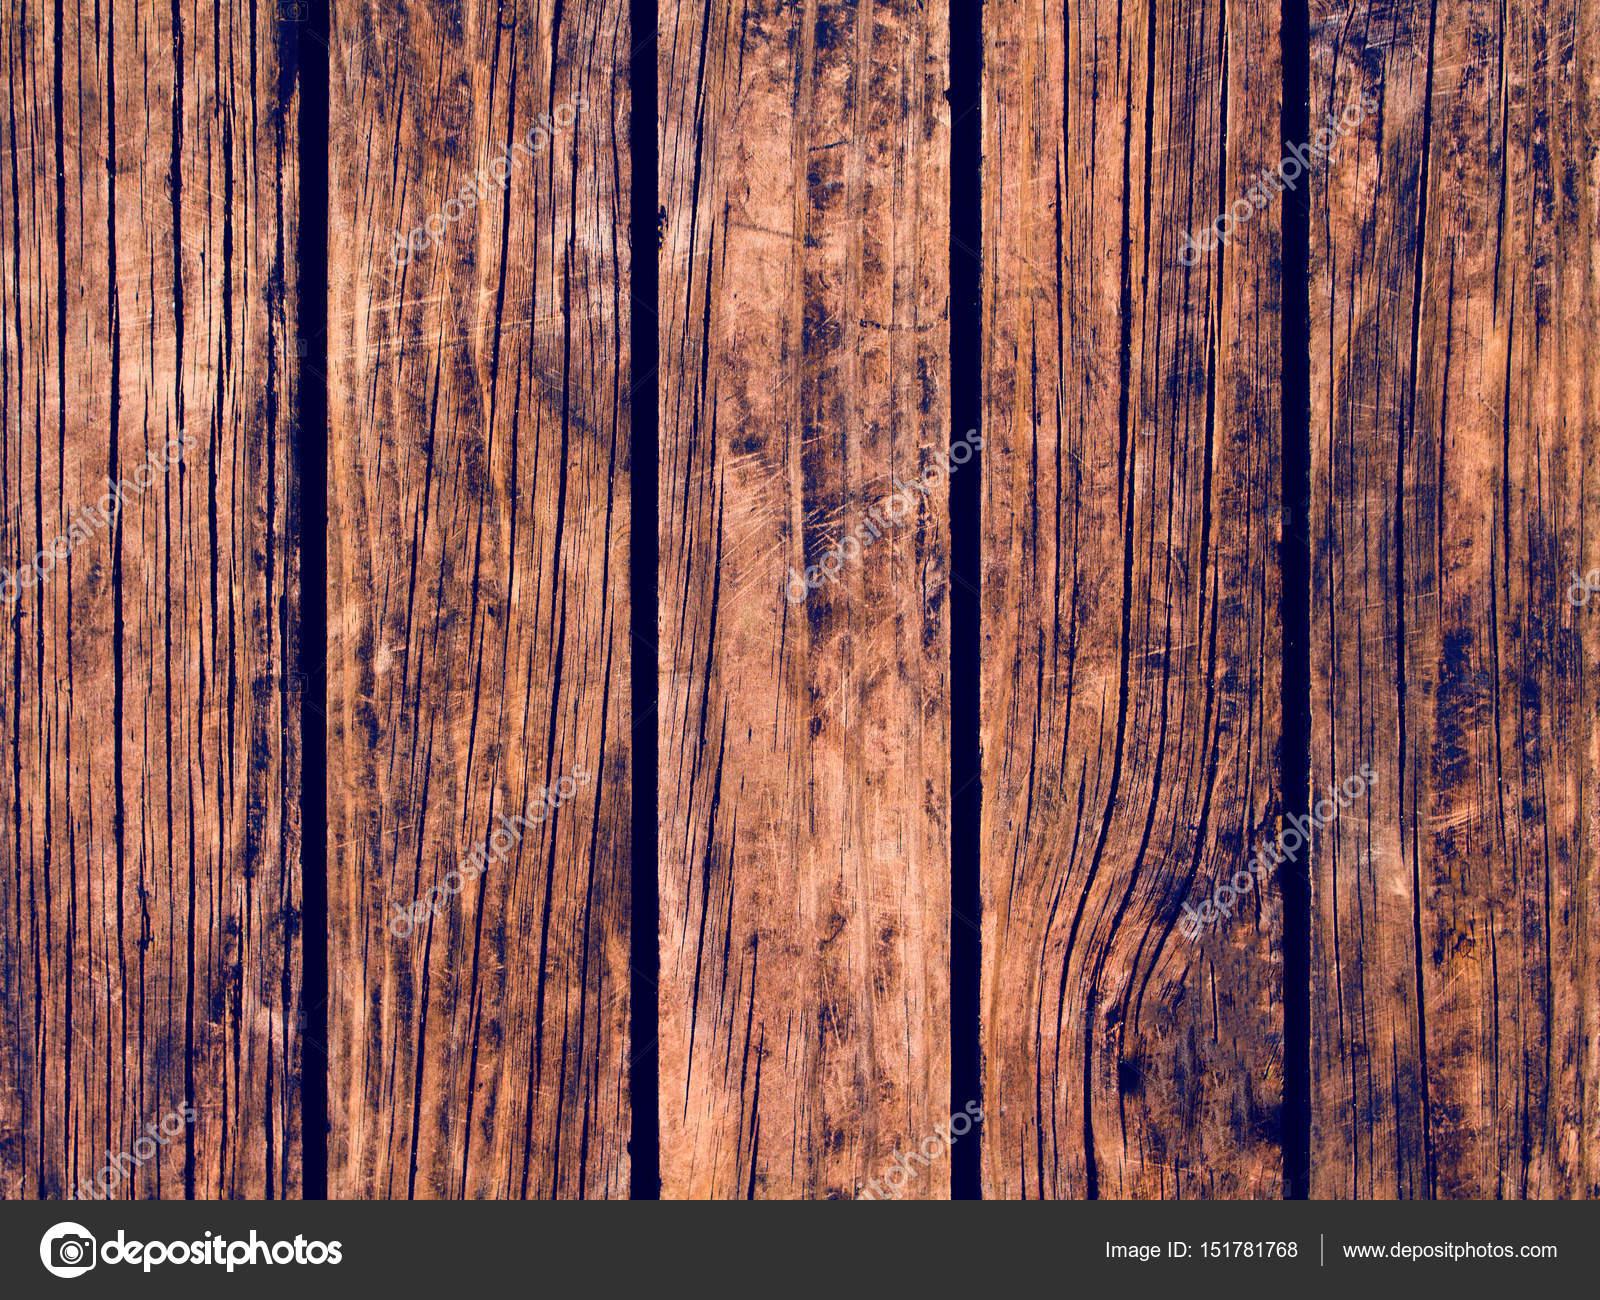 Dark Wood Texture With Vertical Lines Warm Brown Wooden Background